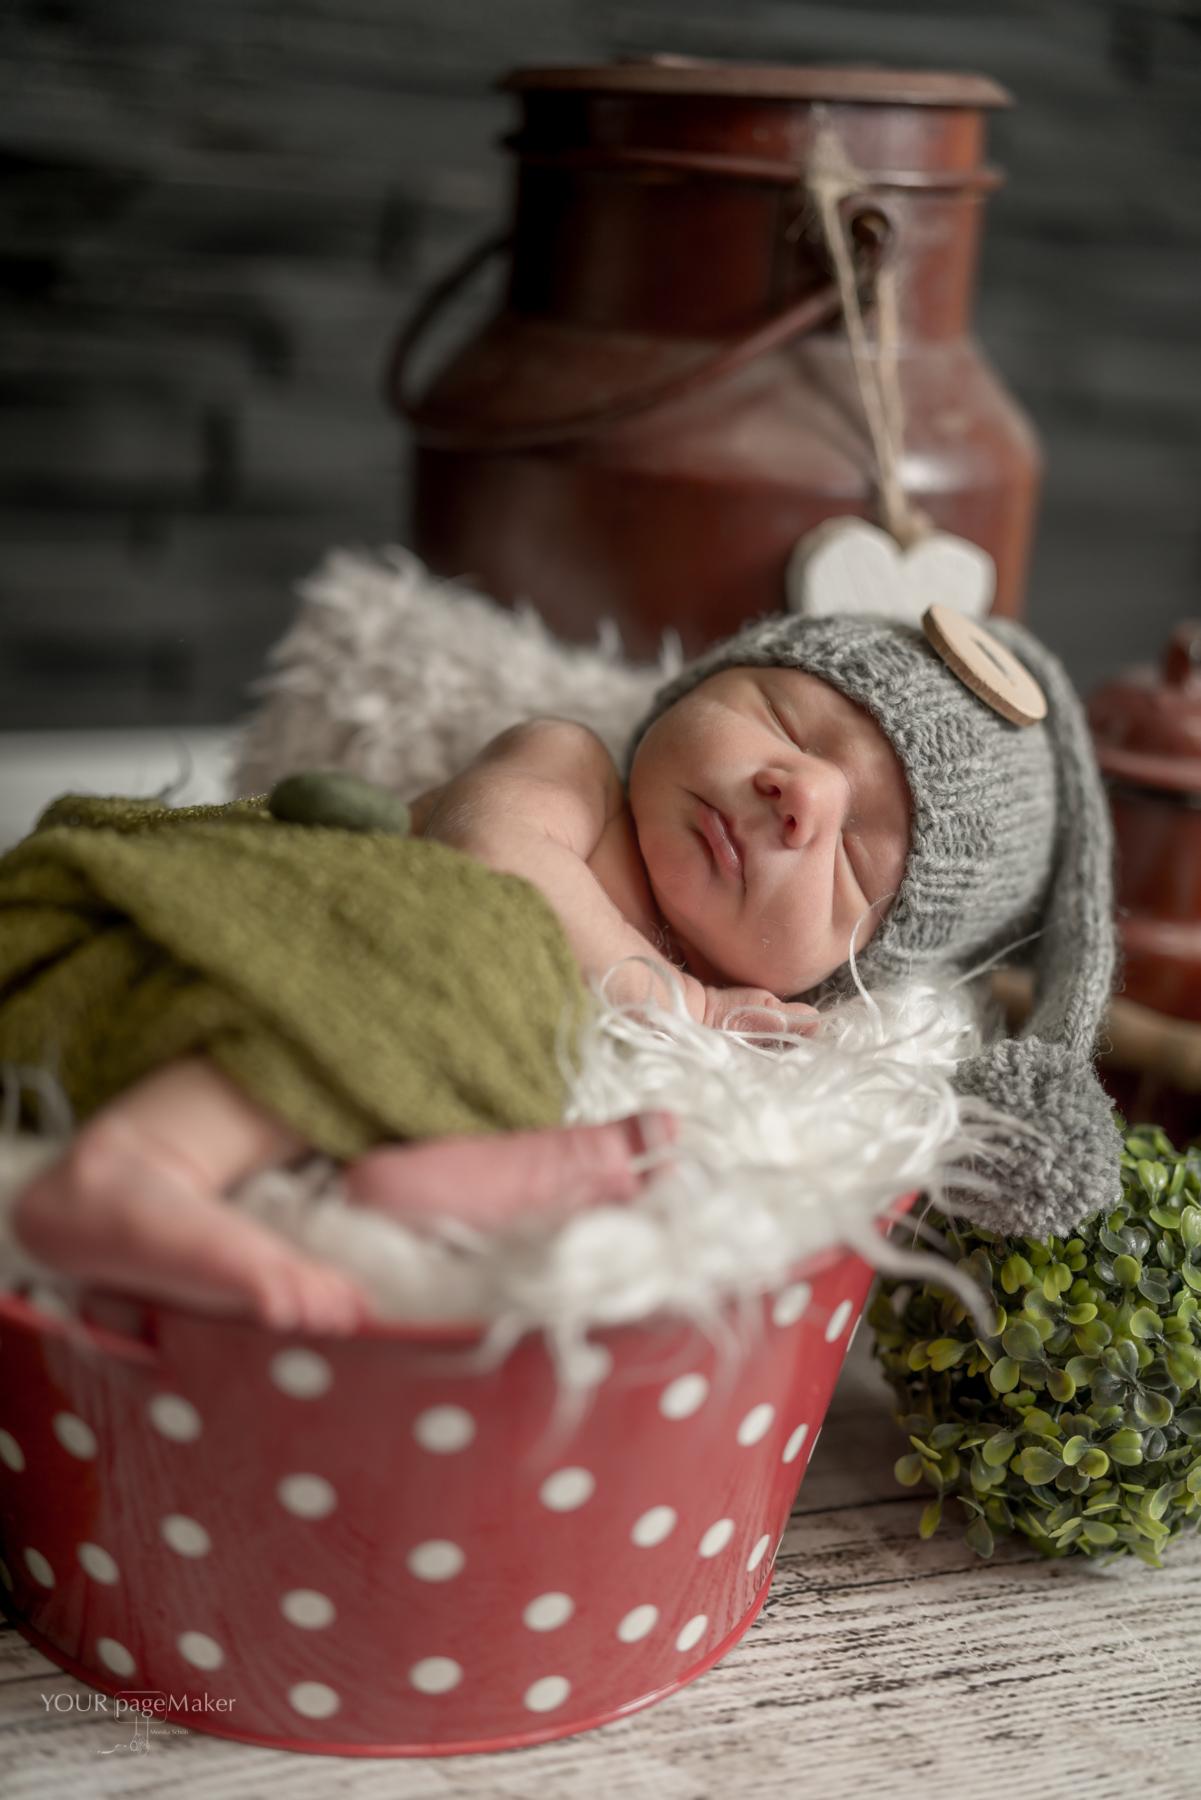 Babyfotografie YOUR pageMaker